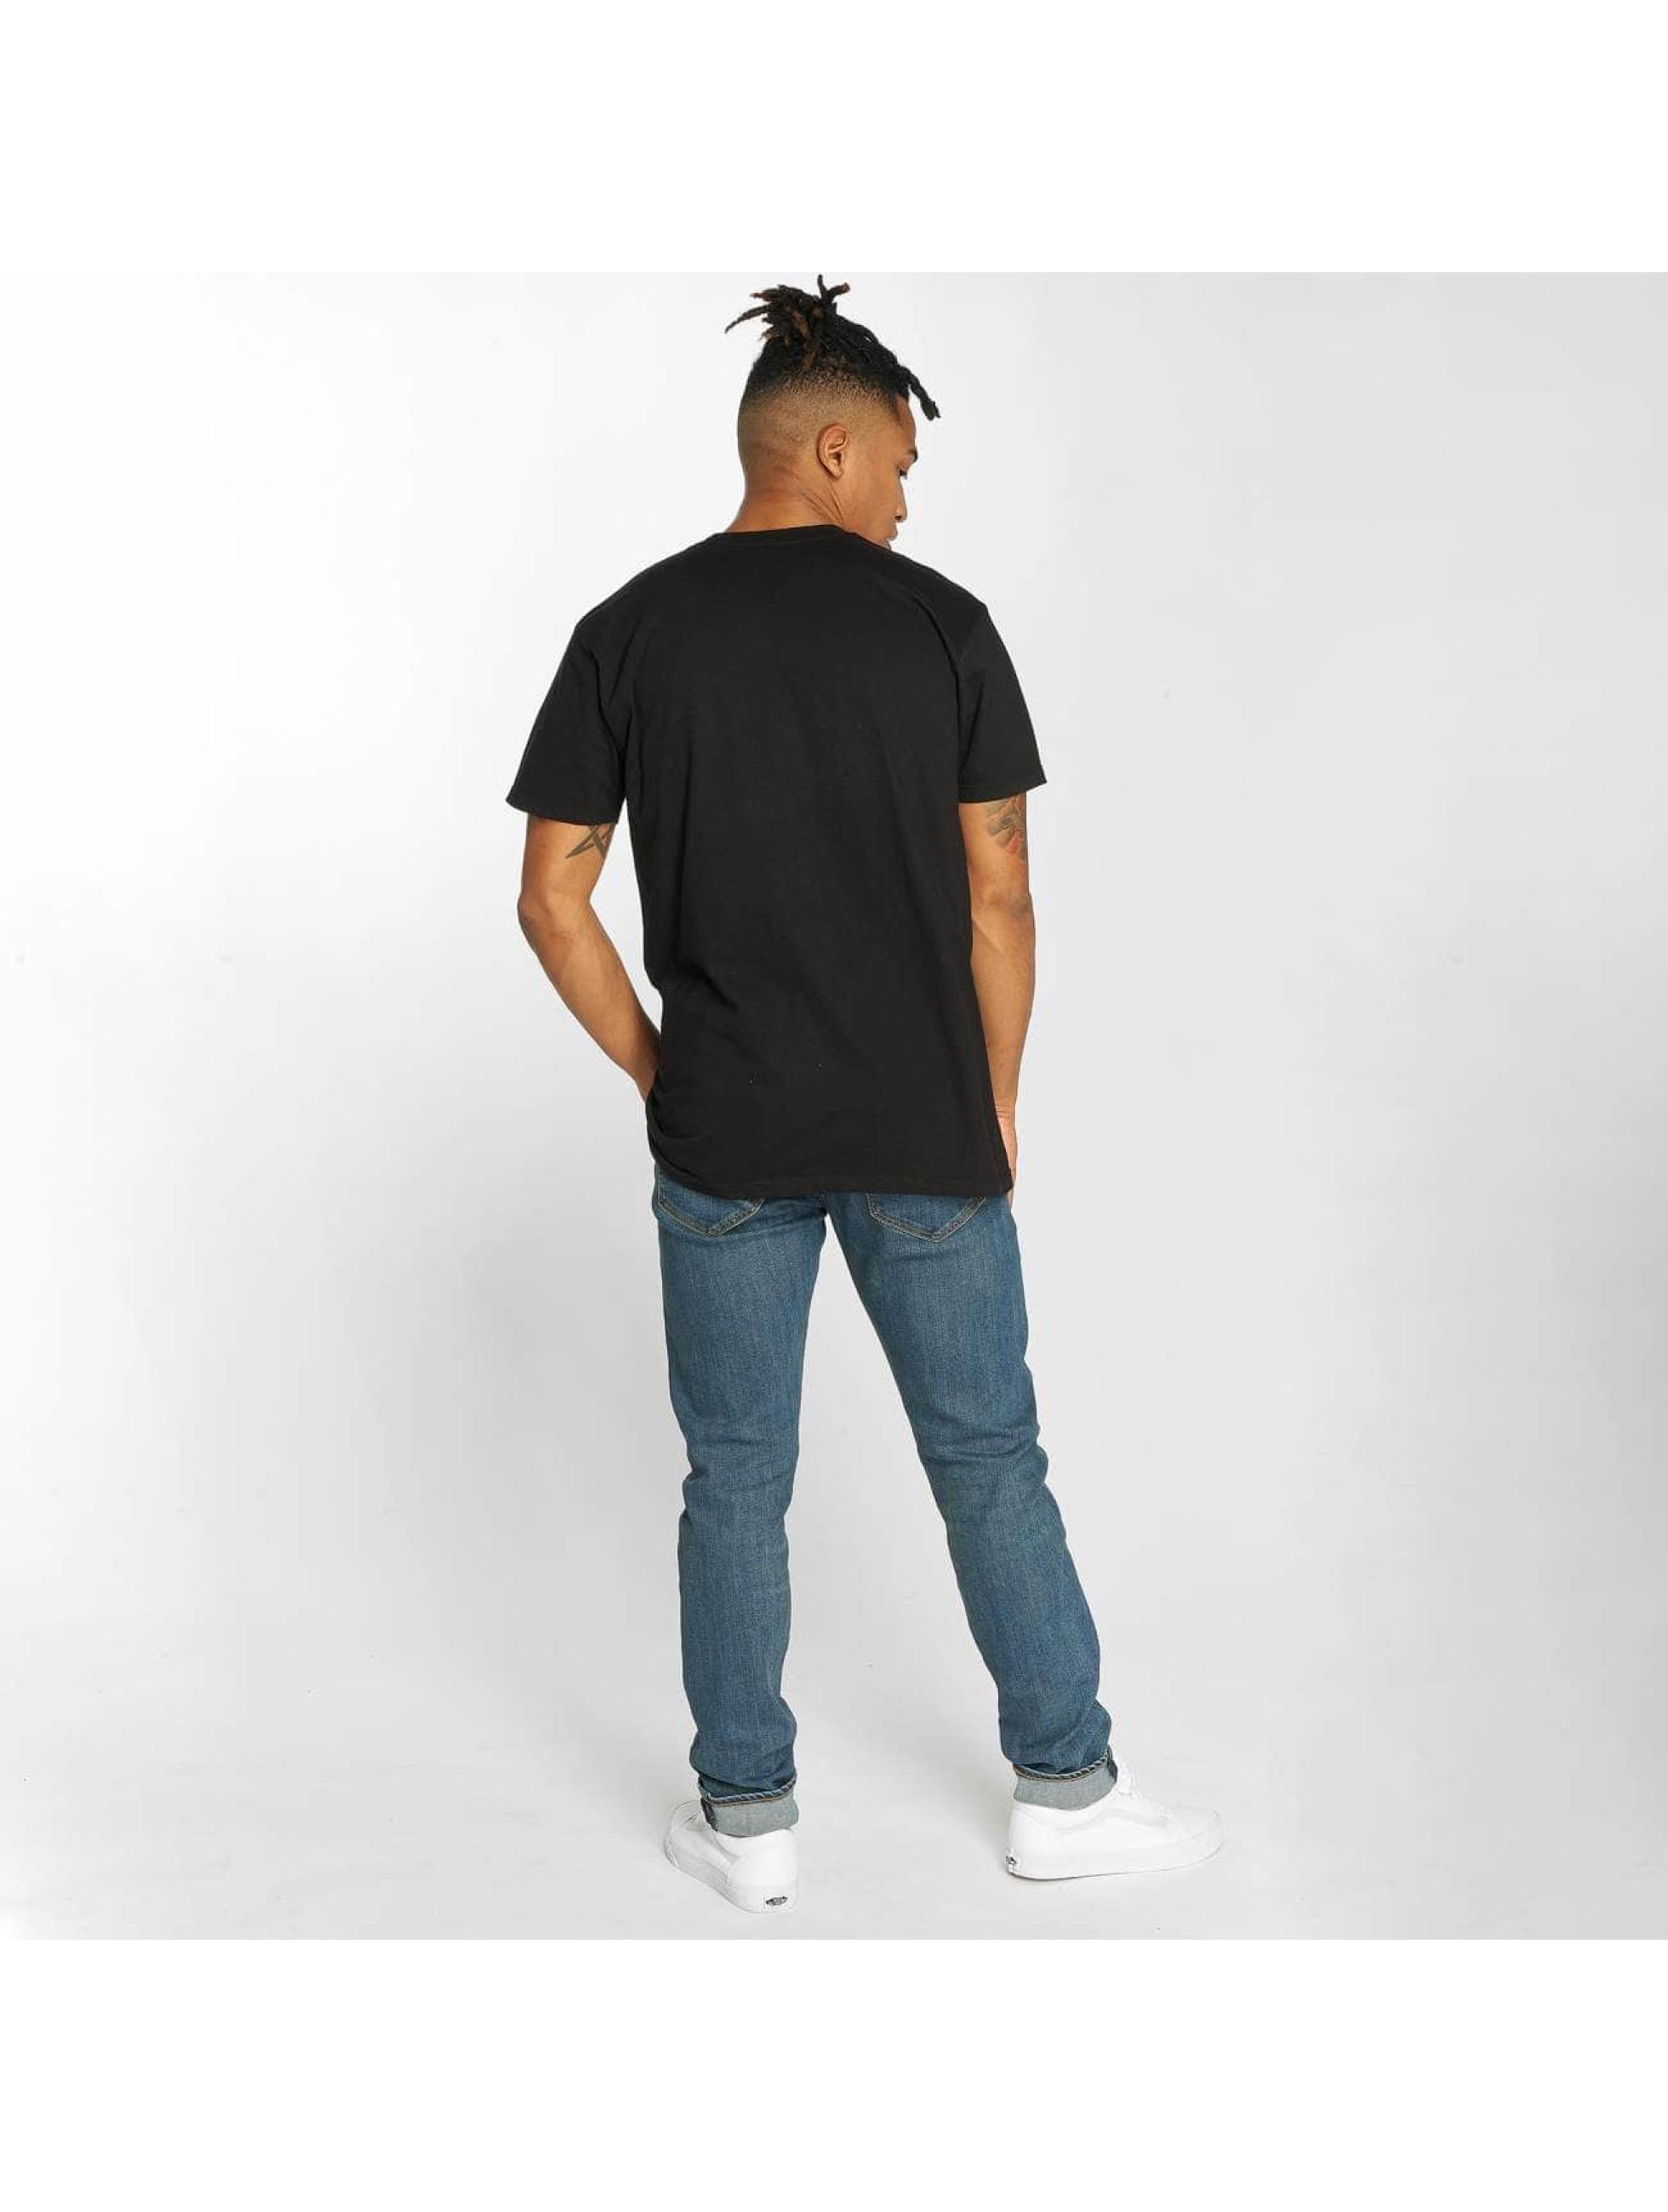 Etnies T-Shirt Icon Sprayed schwarz